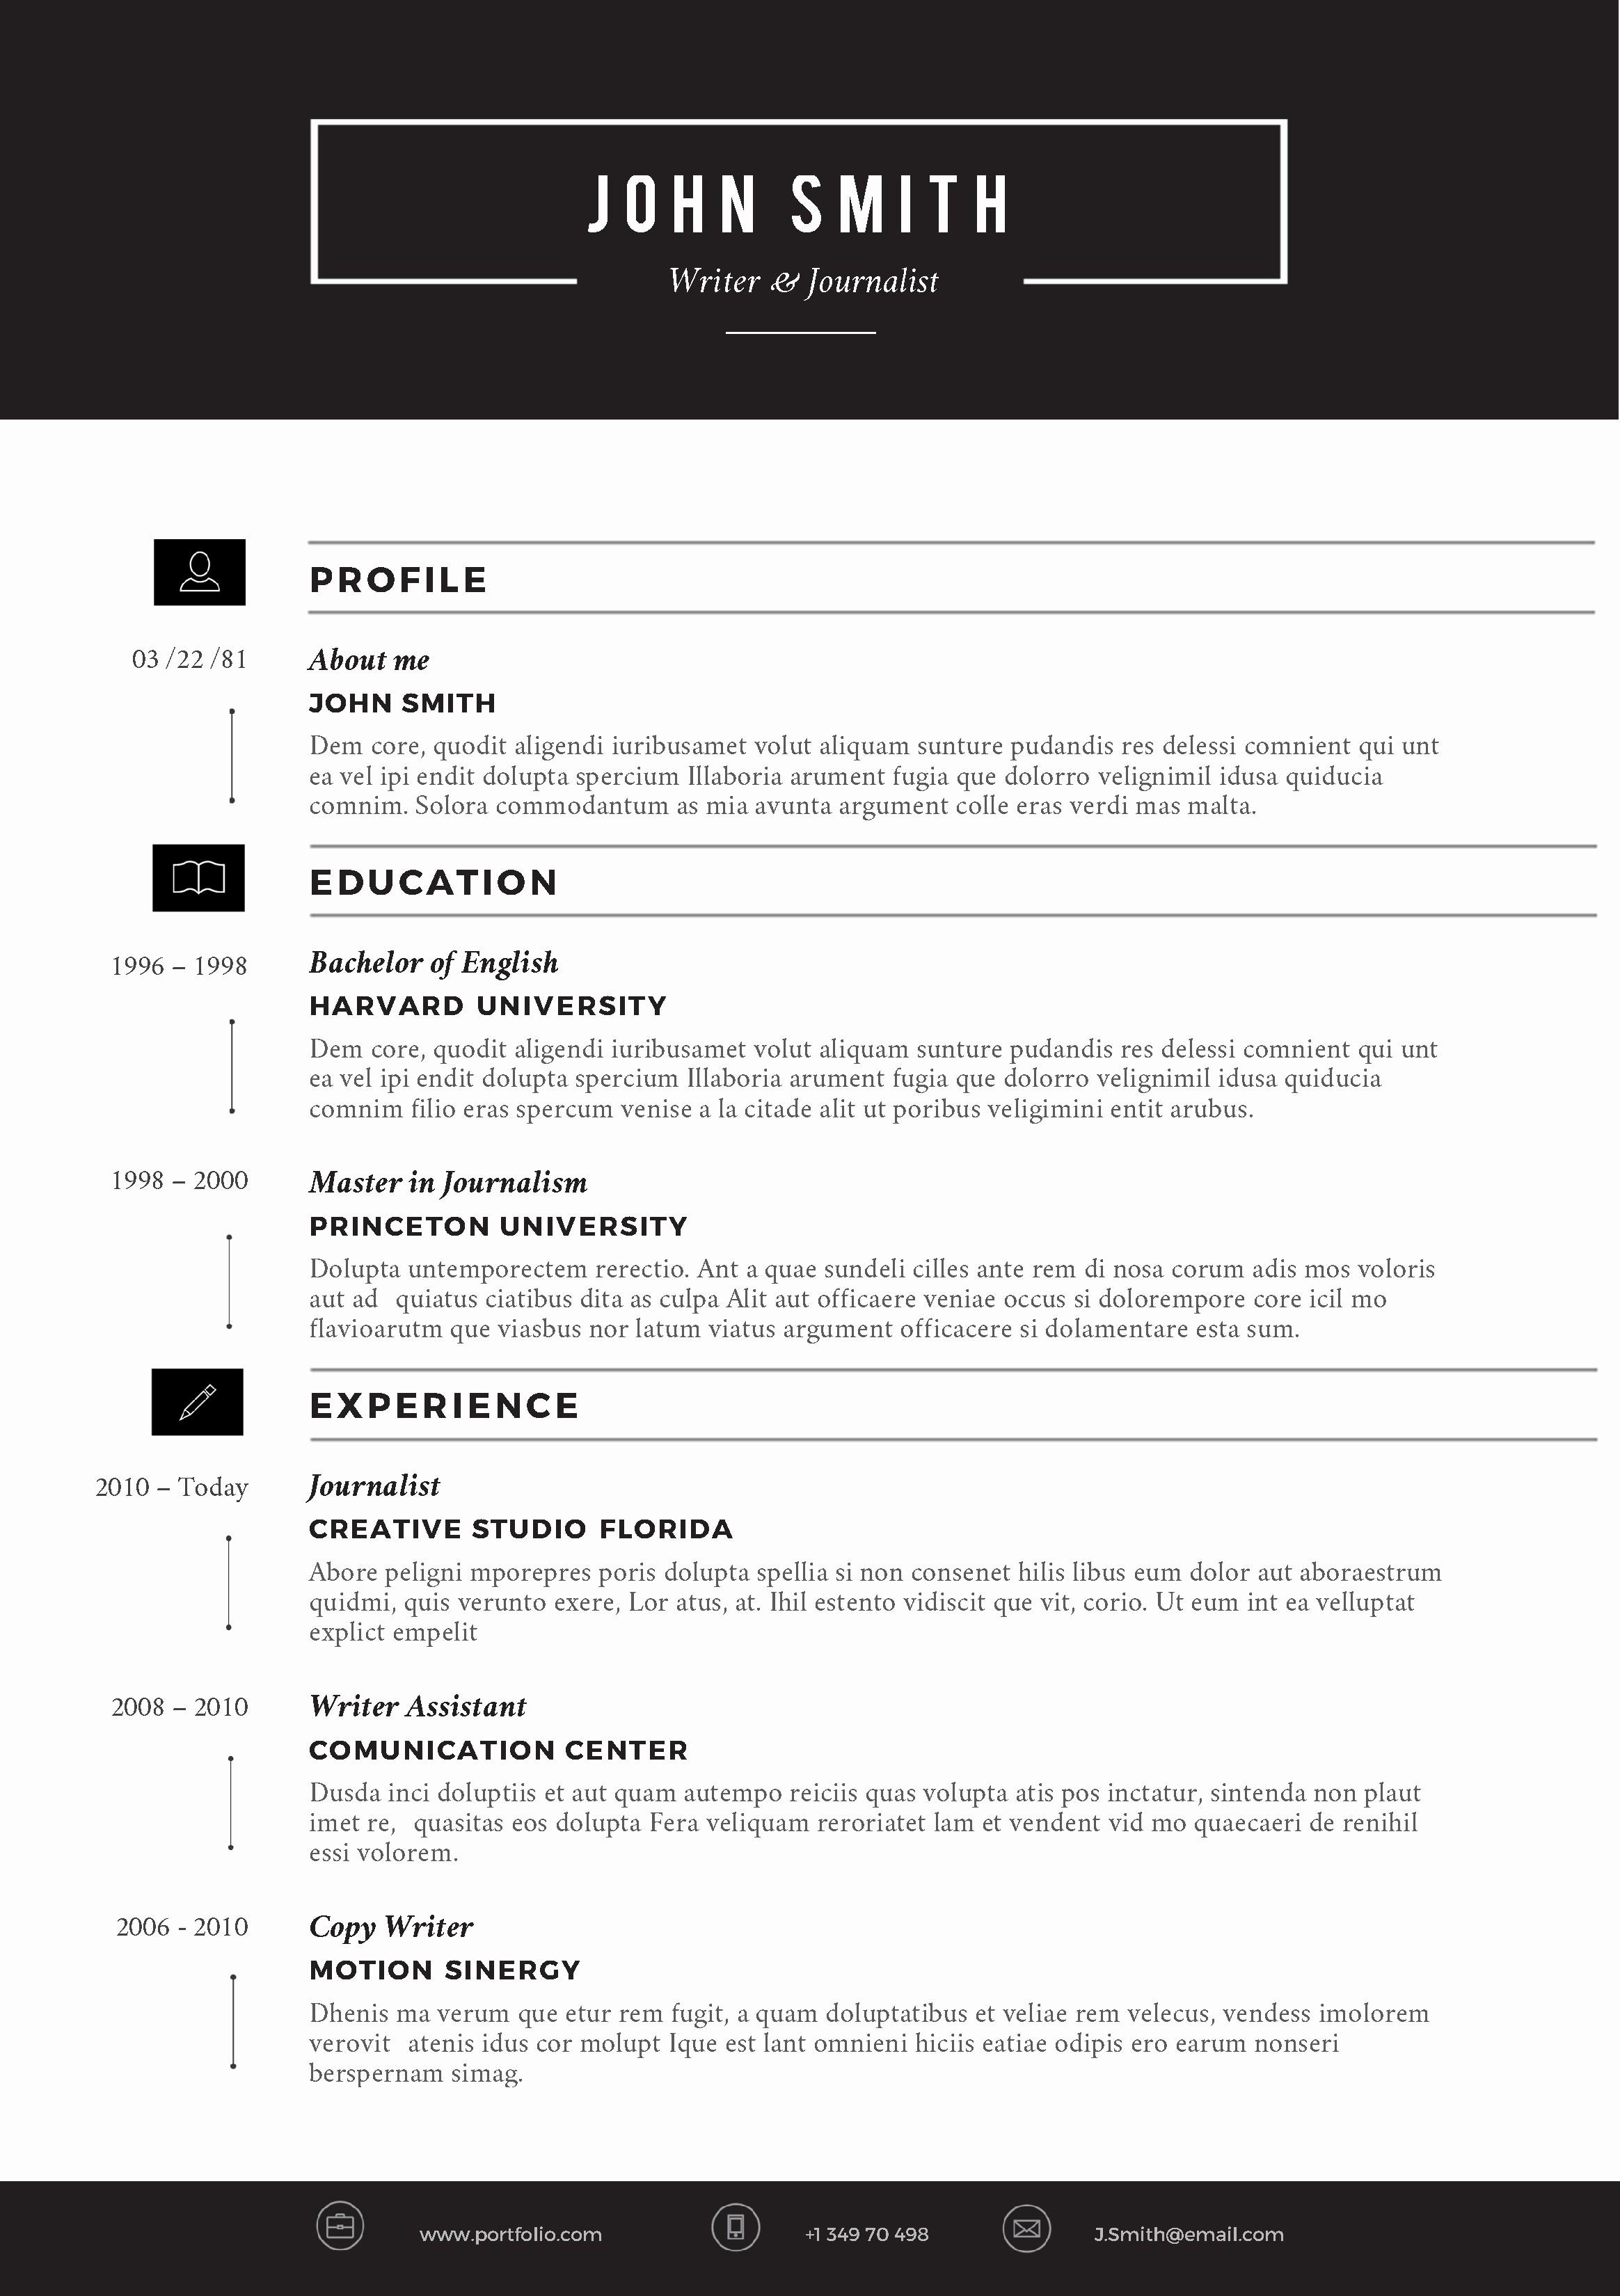 Ms Office Word Resume Templates Luxury Cvfolio Best 10 Resume Templates for Microsoft Word